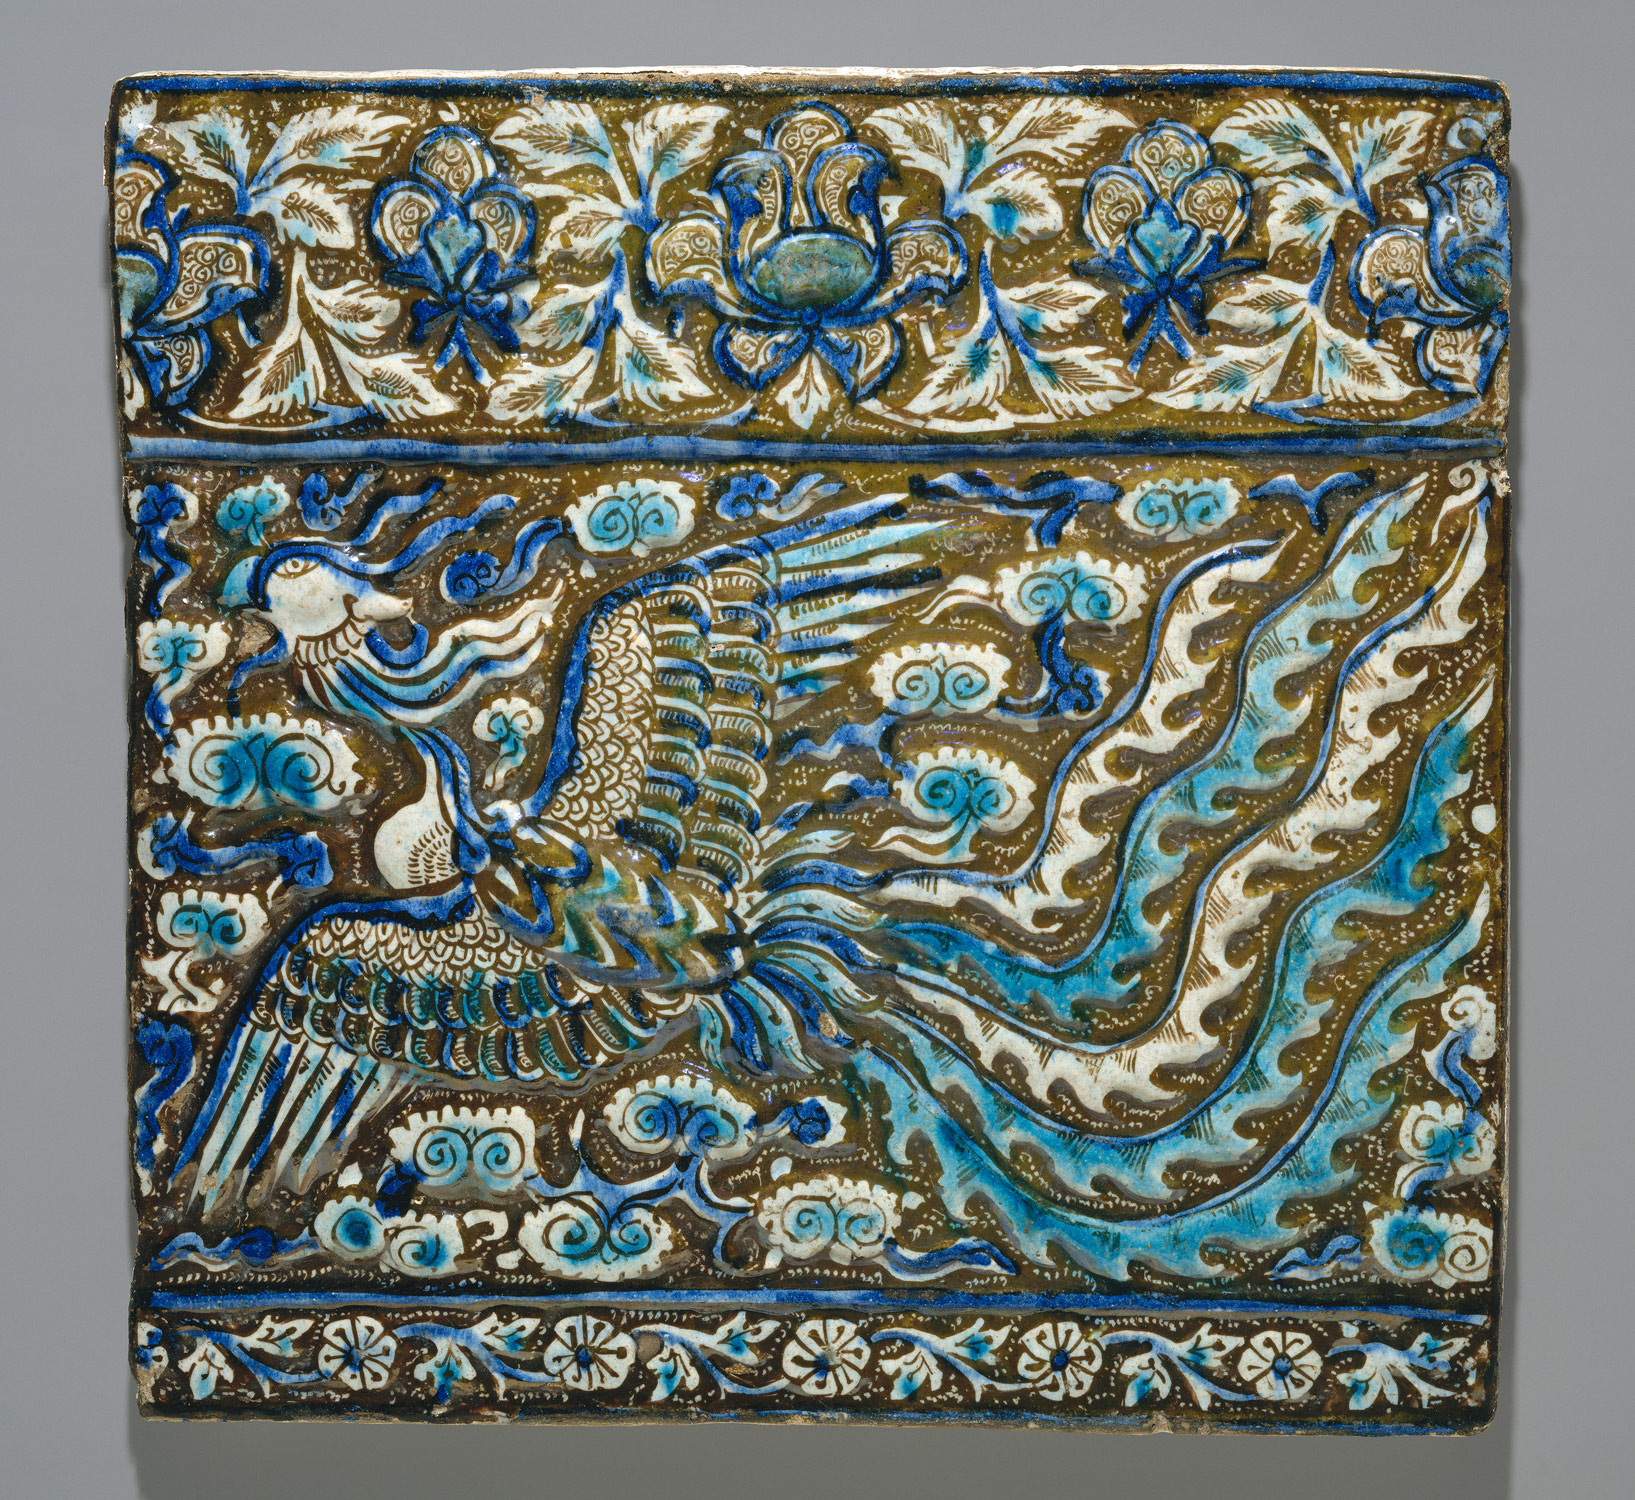 Vegetal Patterns In Islamic Art